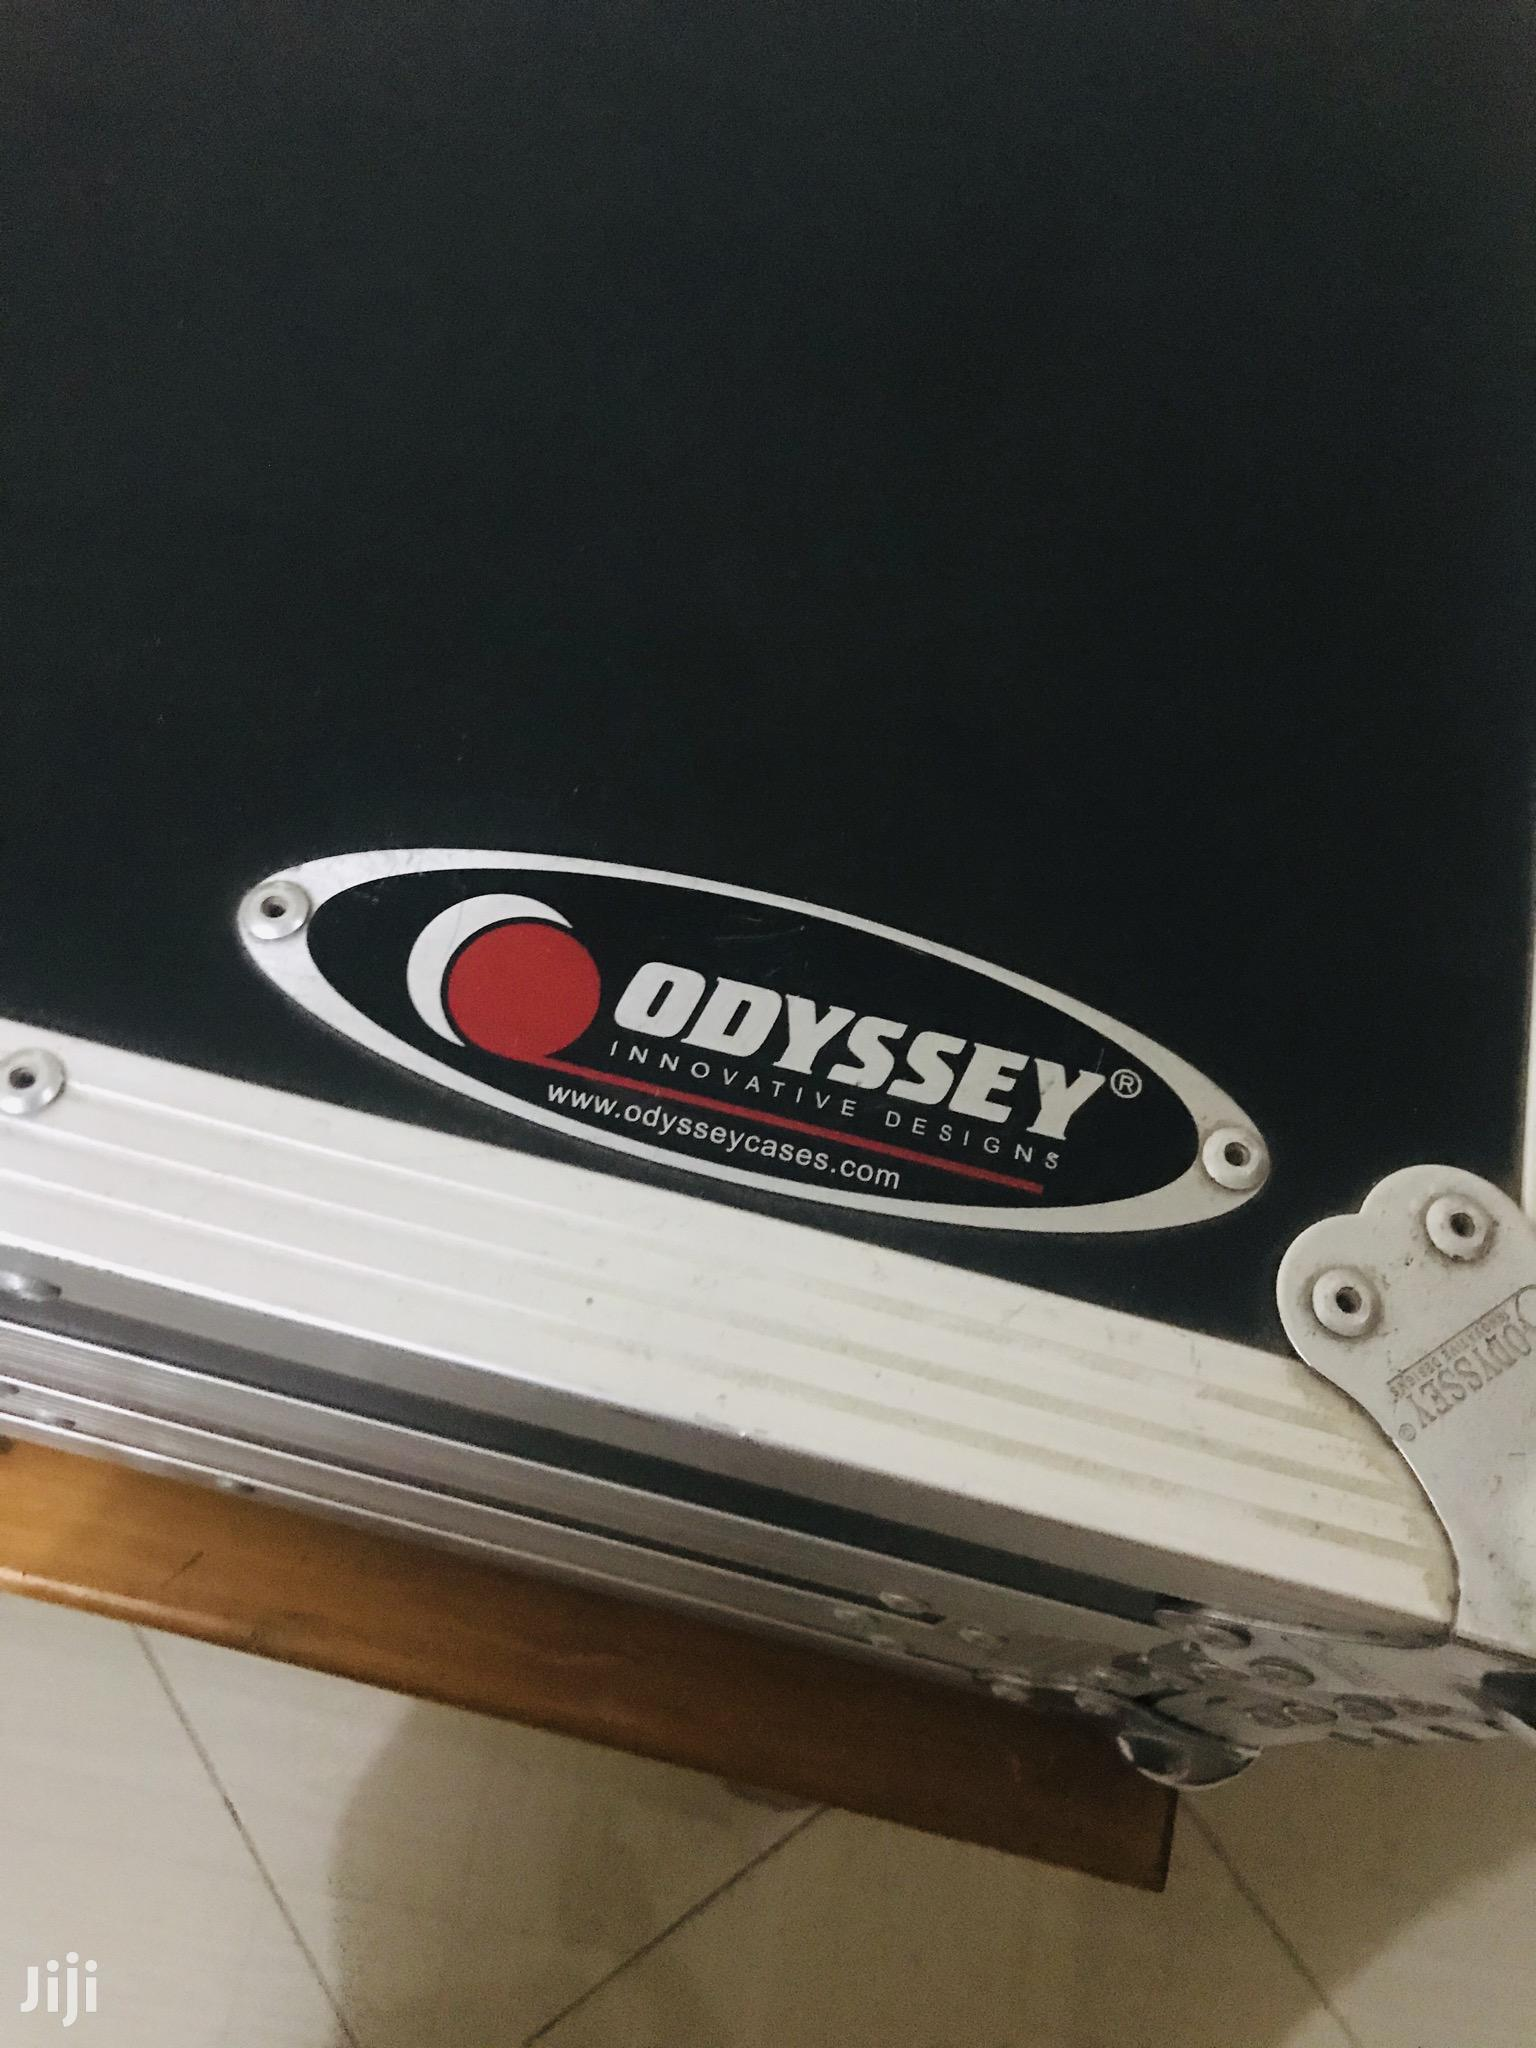 Full DJ KIT Console | Musical Instruments & Gear for sale in Kinondoni, Dar es Salaam, Tanzania